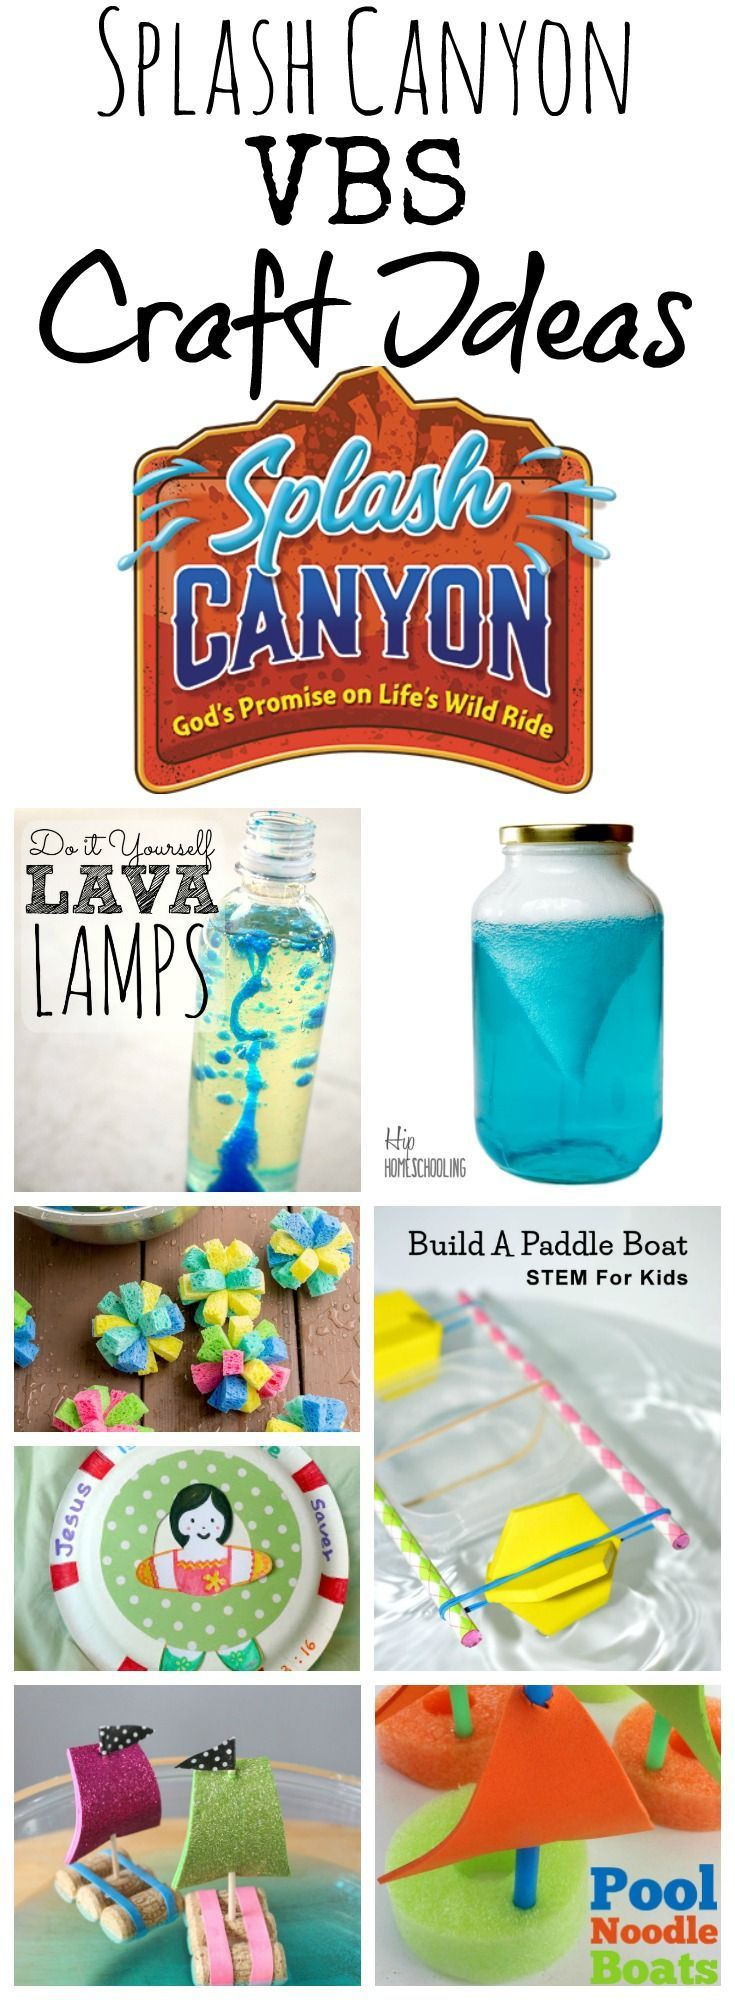 Vacation bible school crafts ideas - Splash Canyon Vbs Craft Ideas